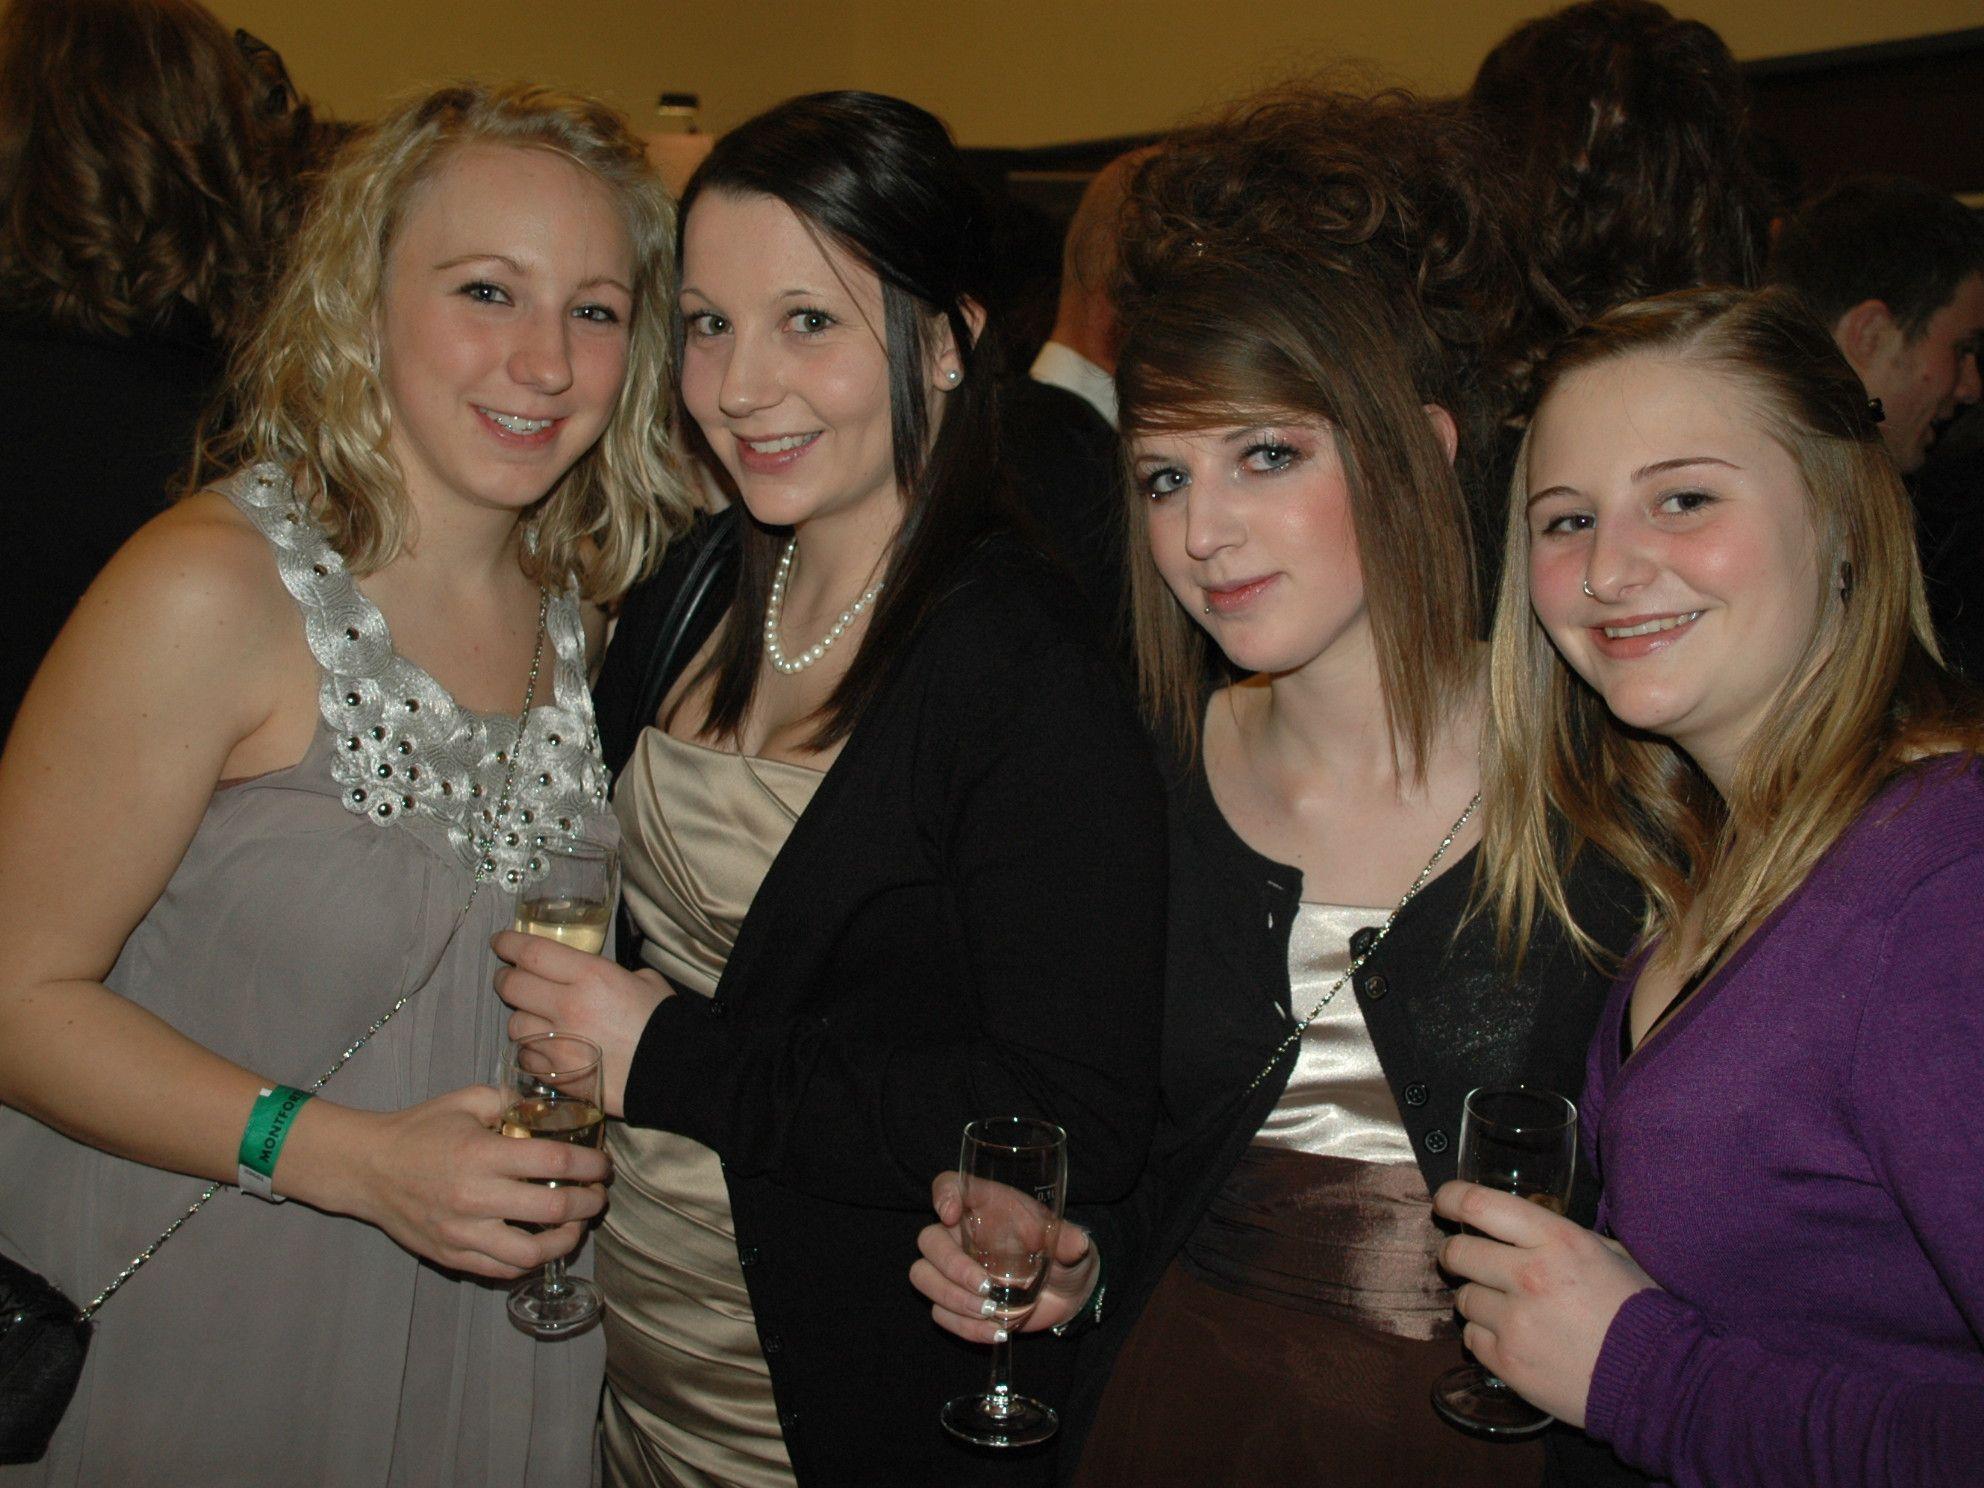 (v.l.) Selina, Isabell, Marina & Ilona feierten ausgelassen beim Diplomball in Feldkirch